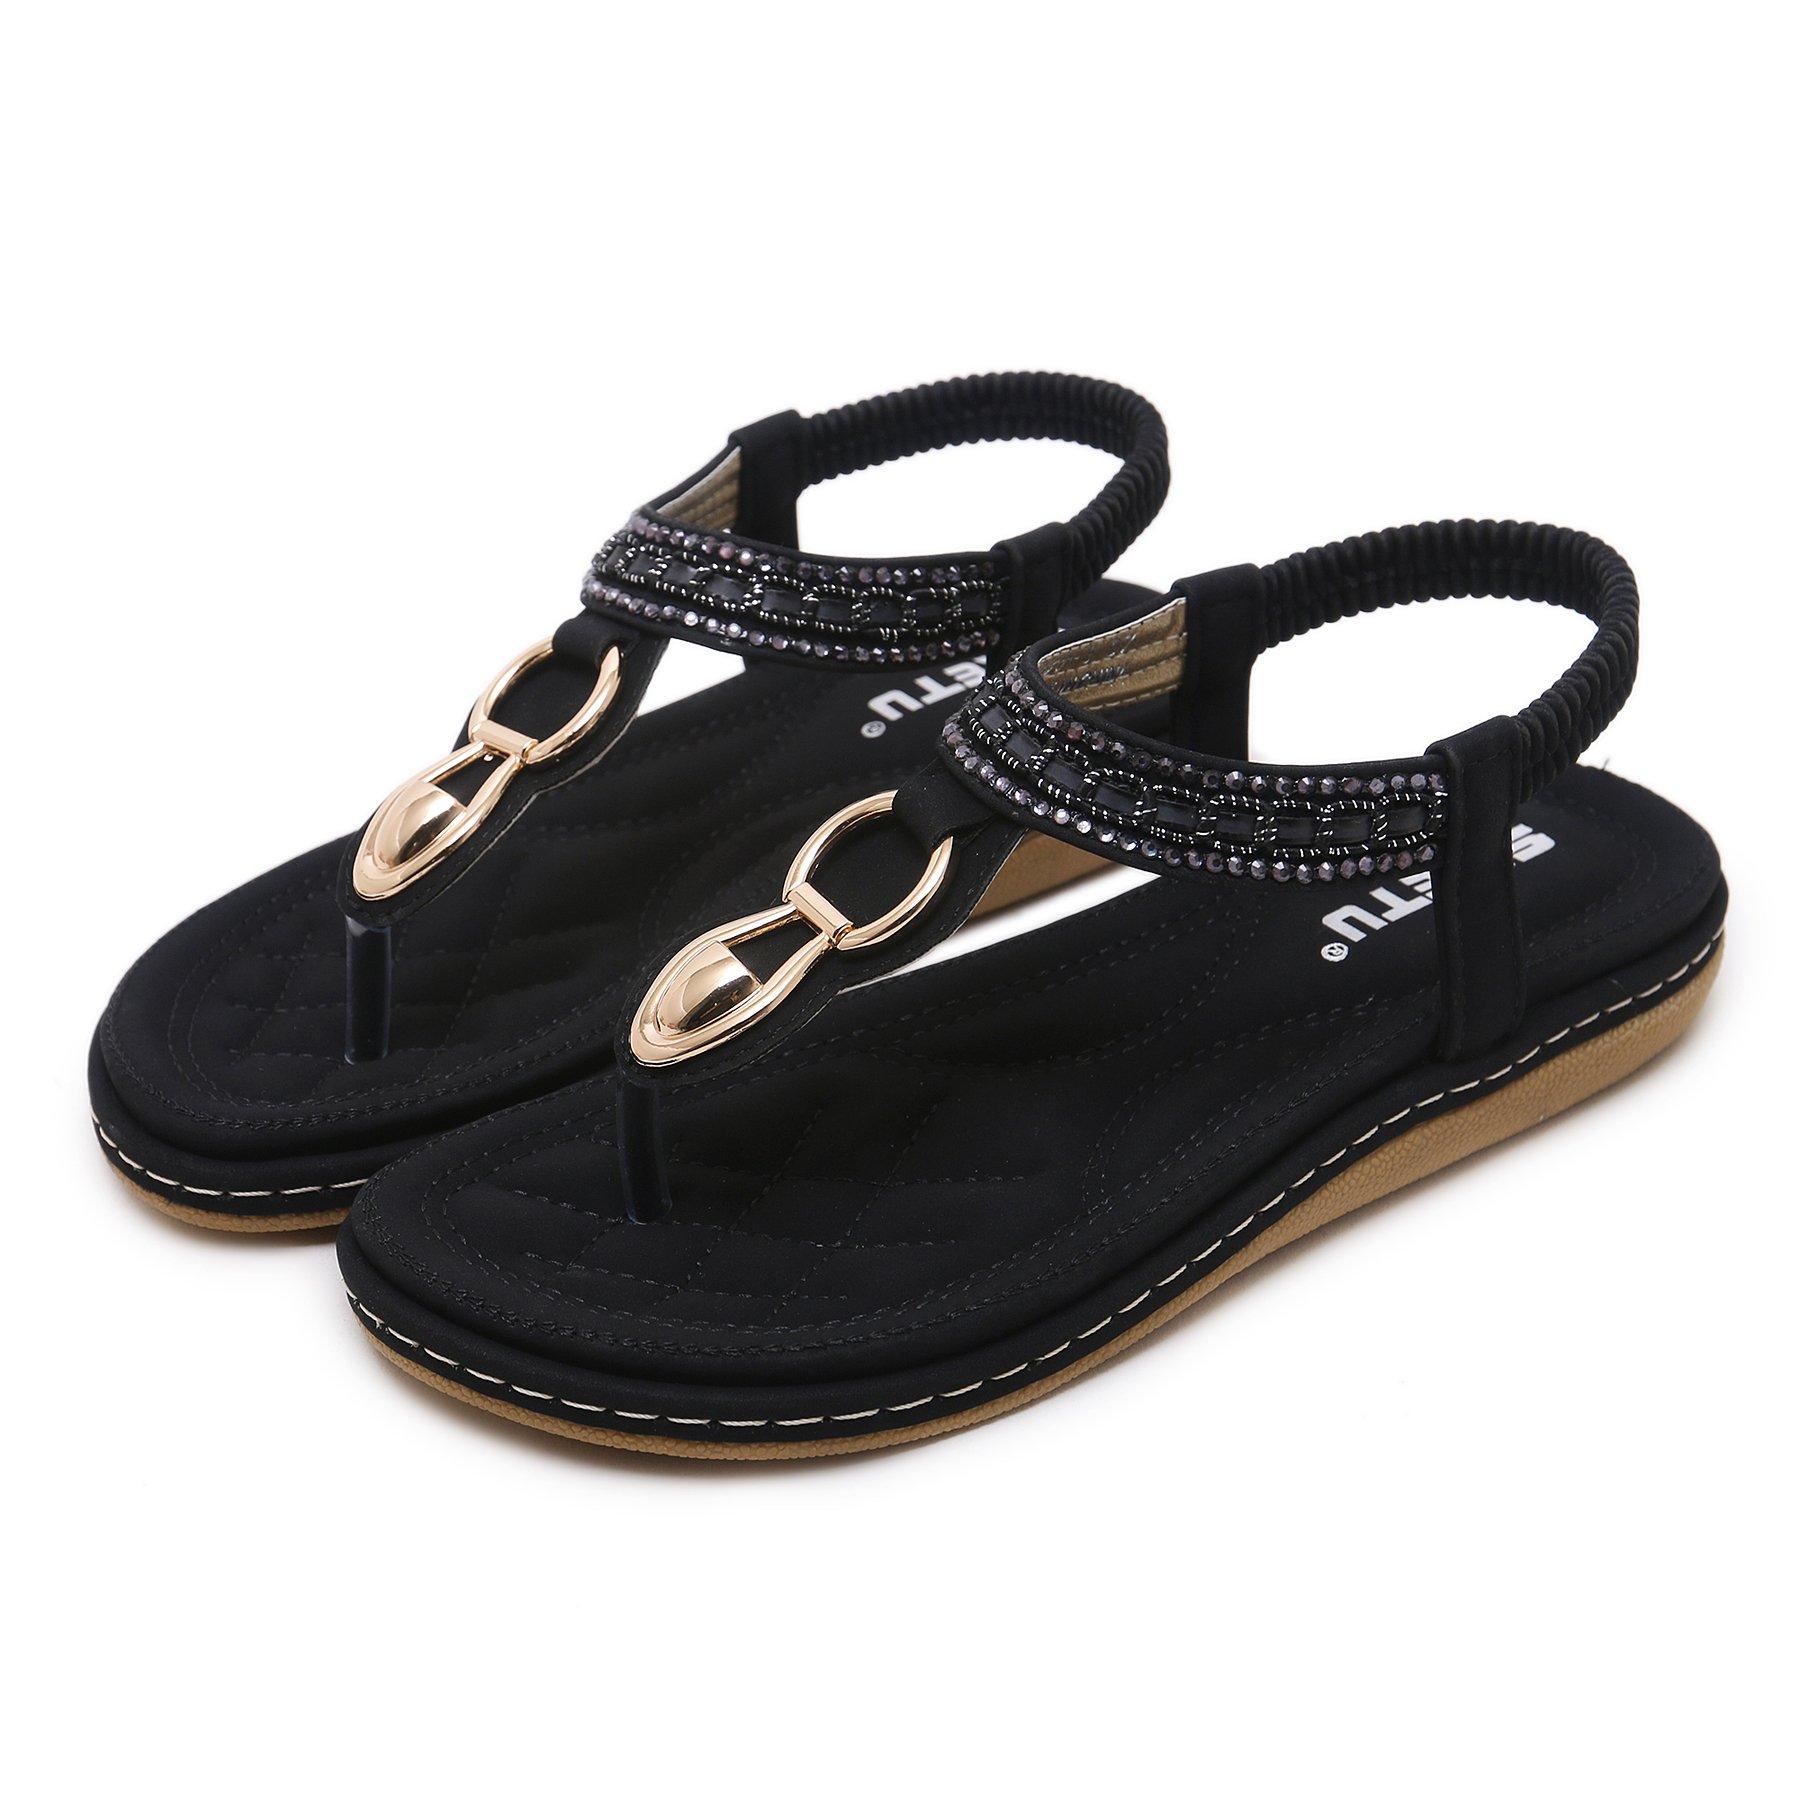 Memorygou Women Flat Sandals Bohemian Style T-Strap Thong Shoes Metal Buckled Crystal Flip Flops Black US 11